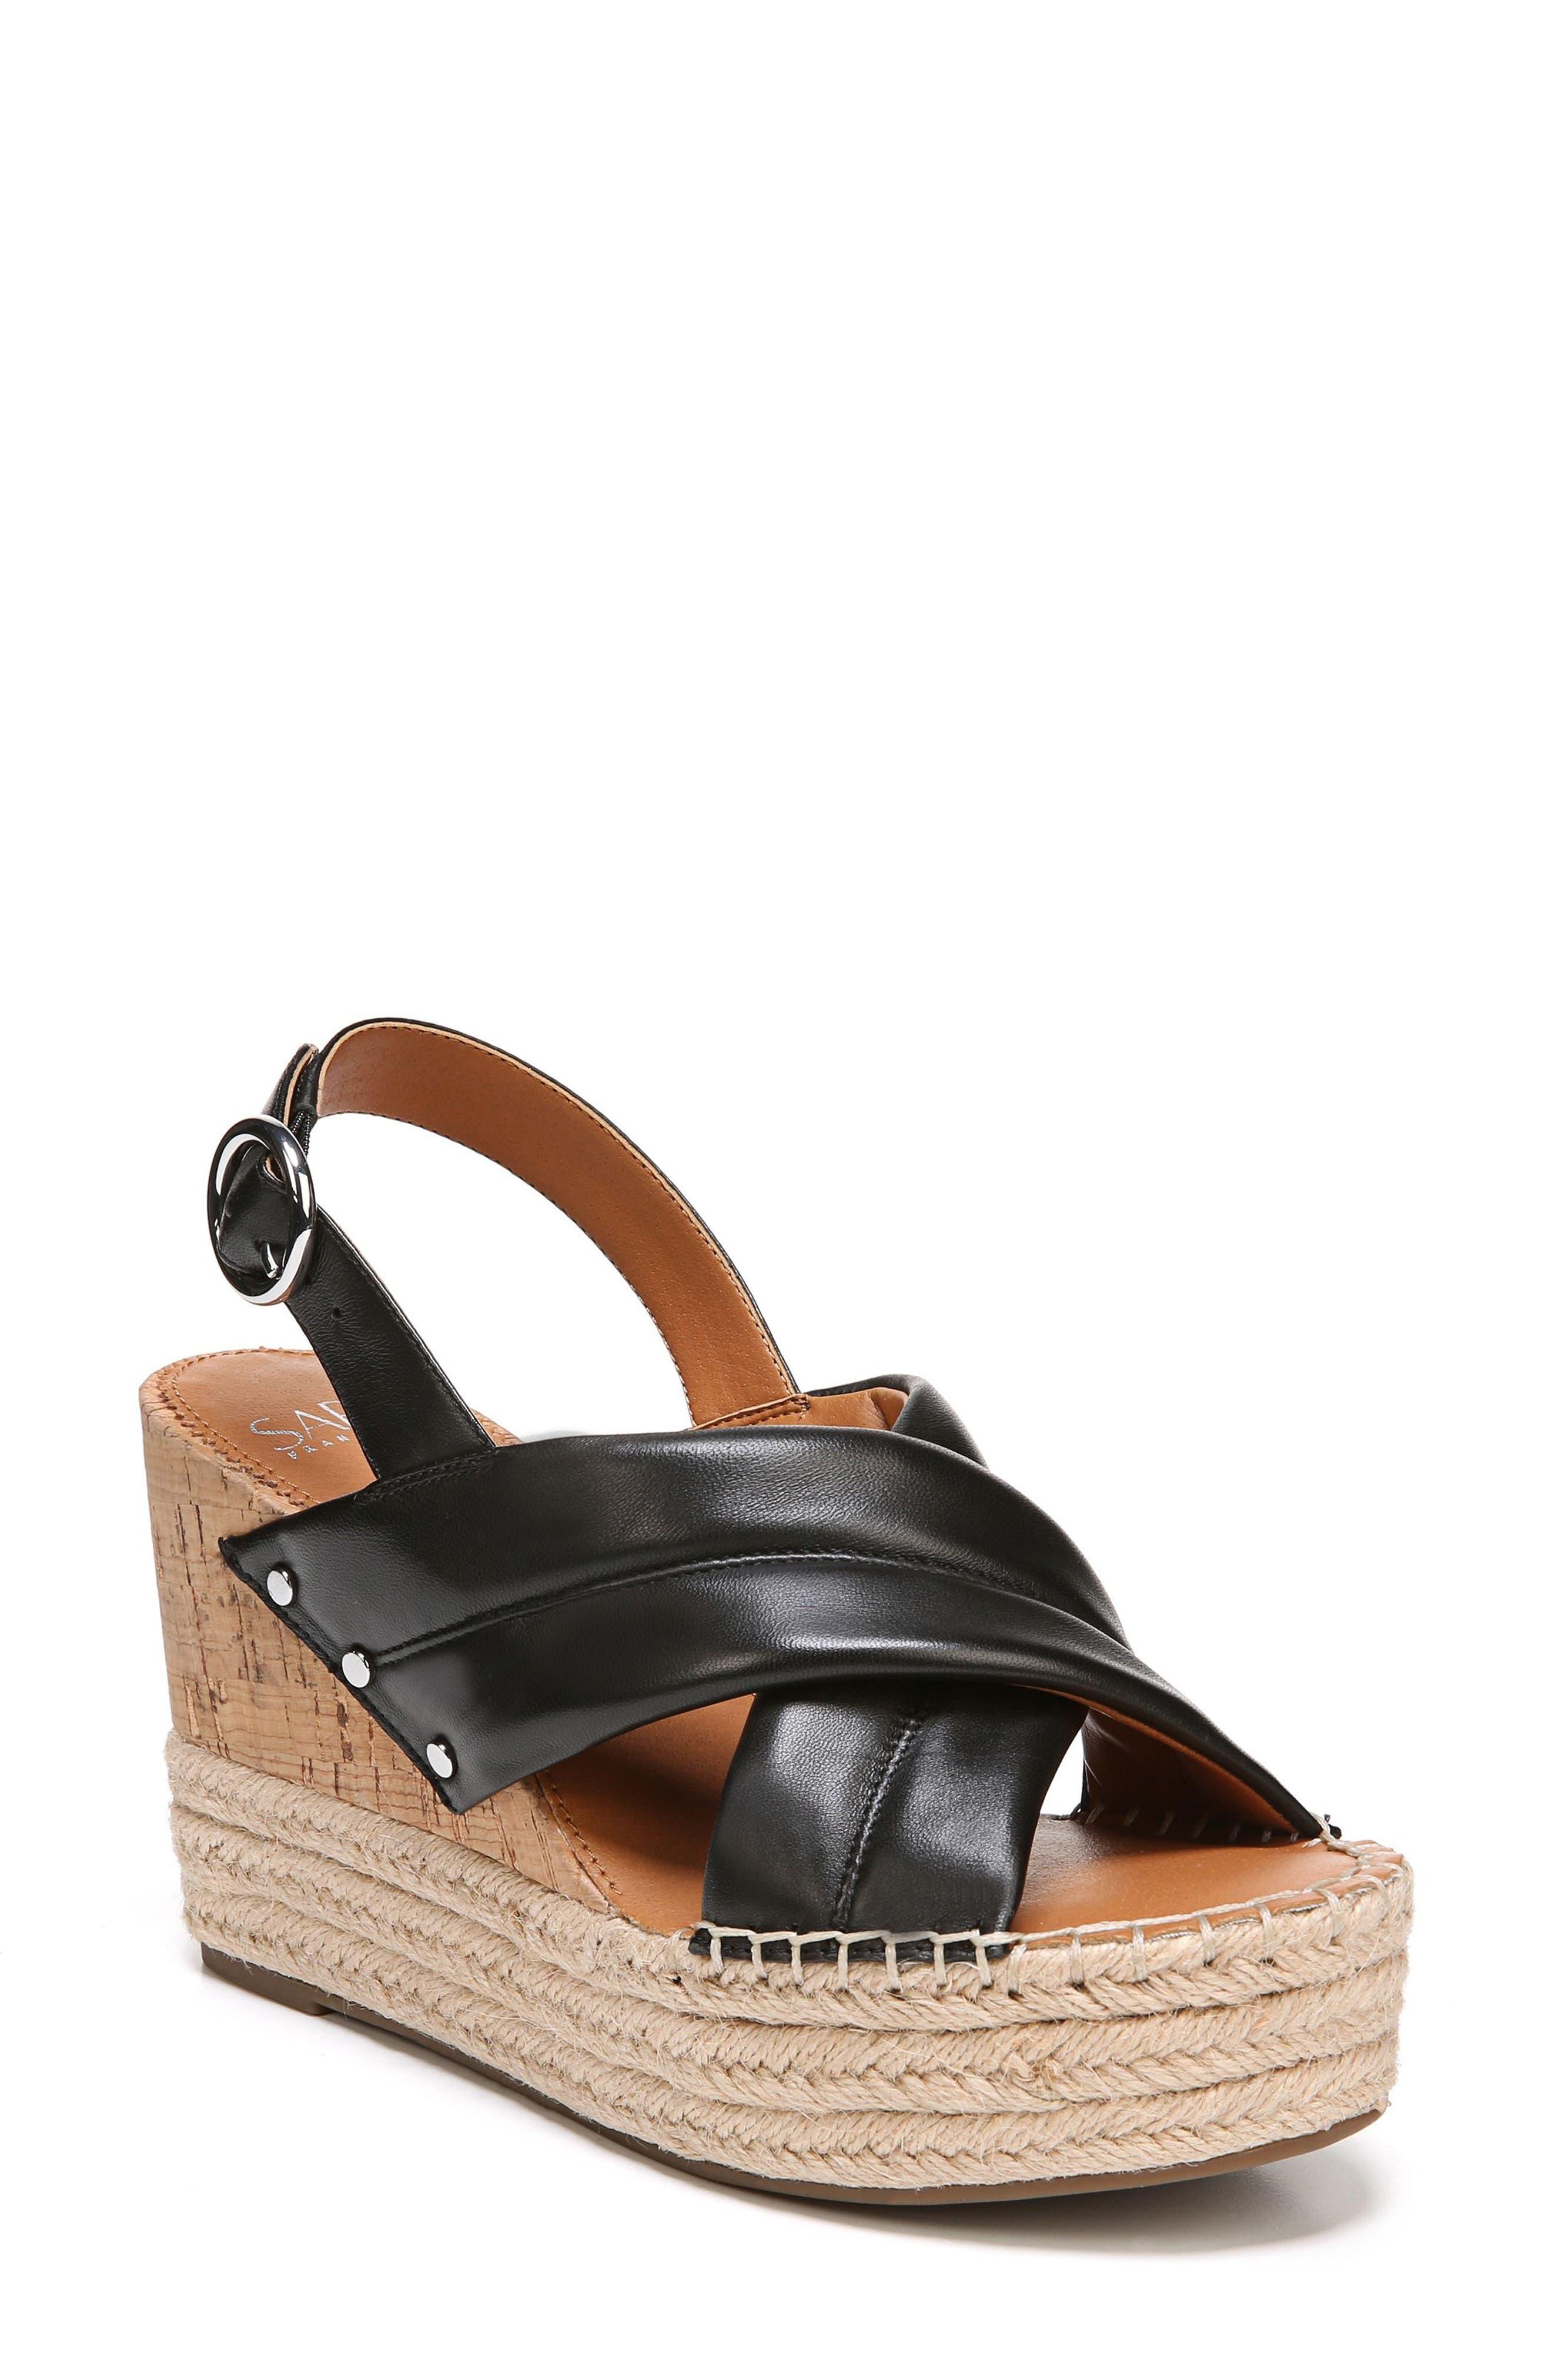 Niva Espadrille Wedge Sandal,                         Main,                         color,